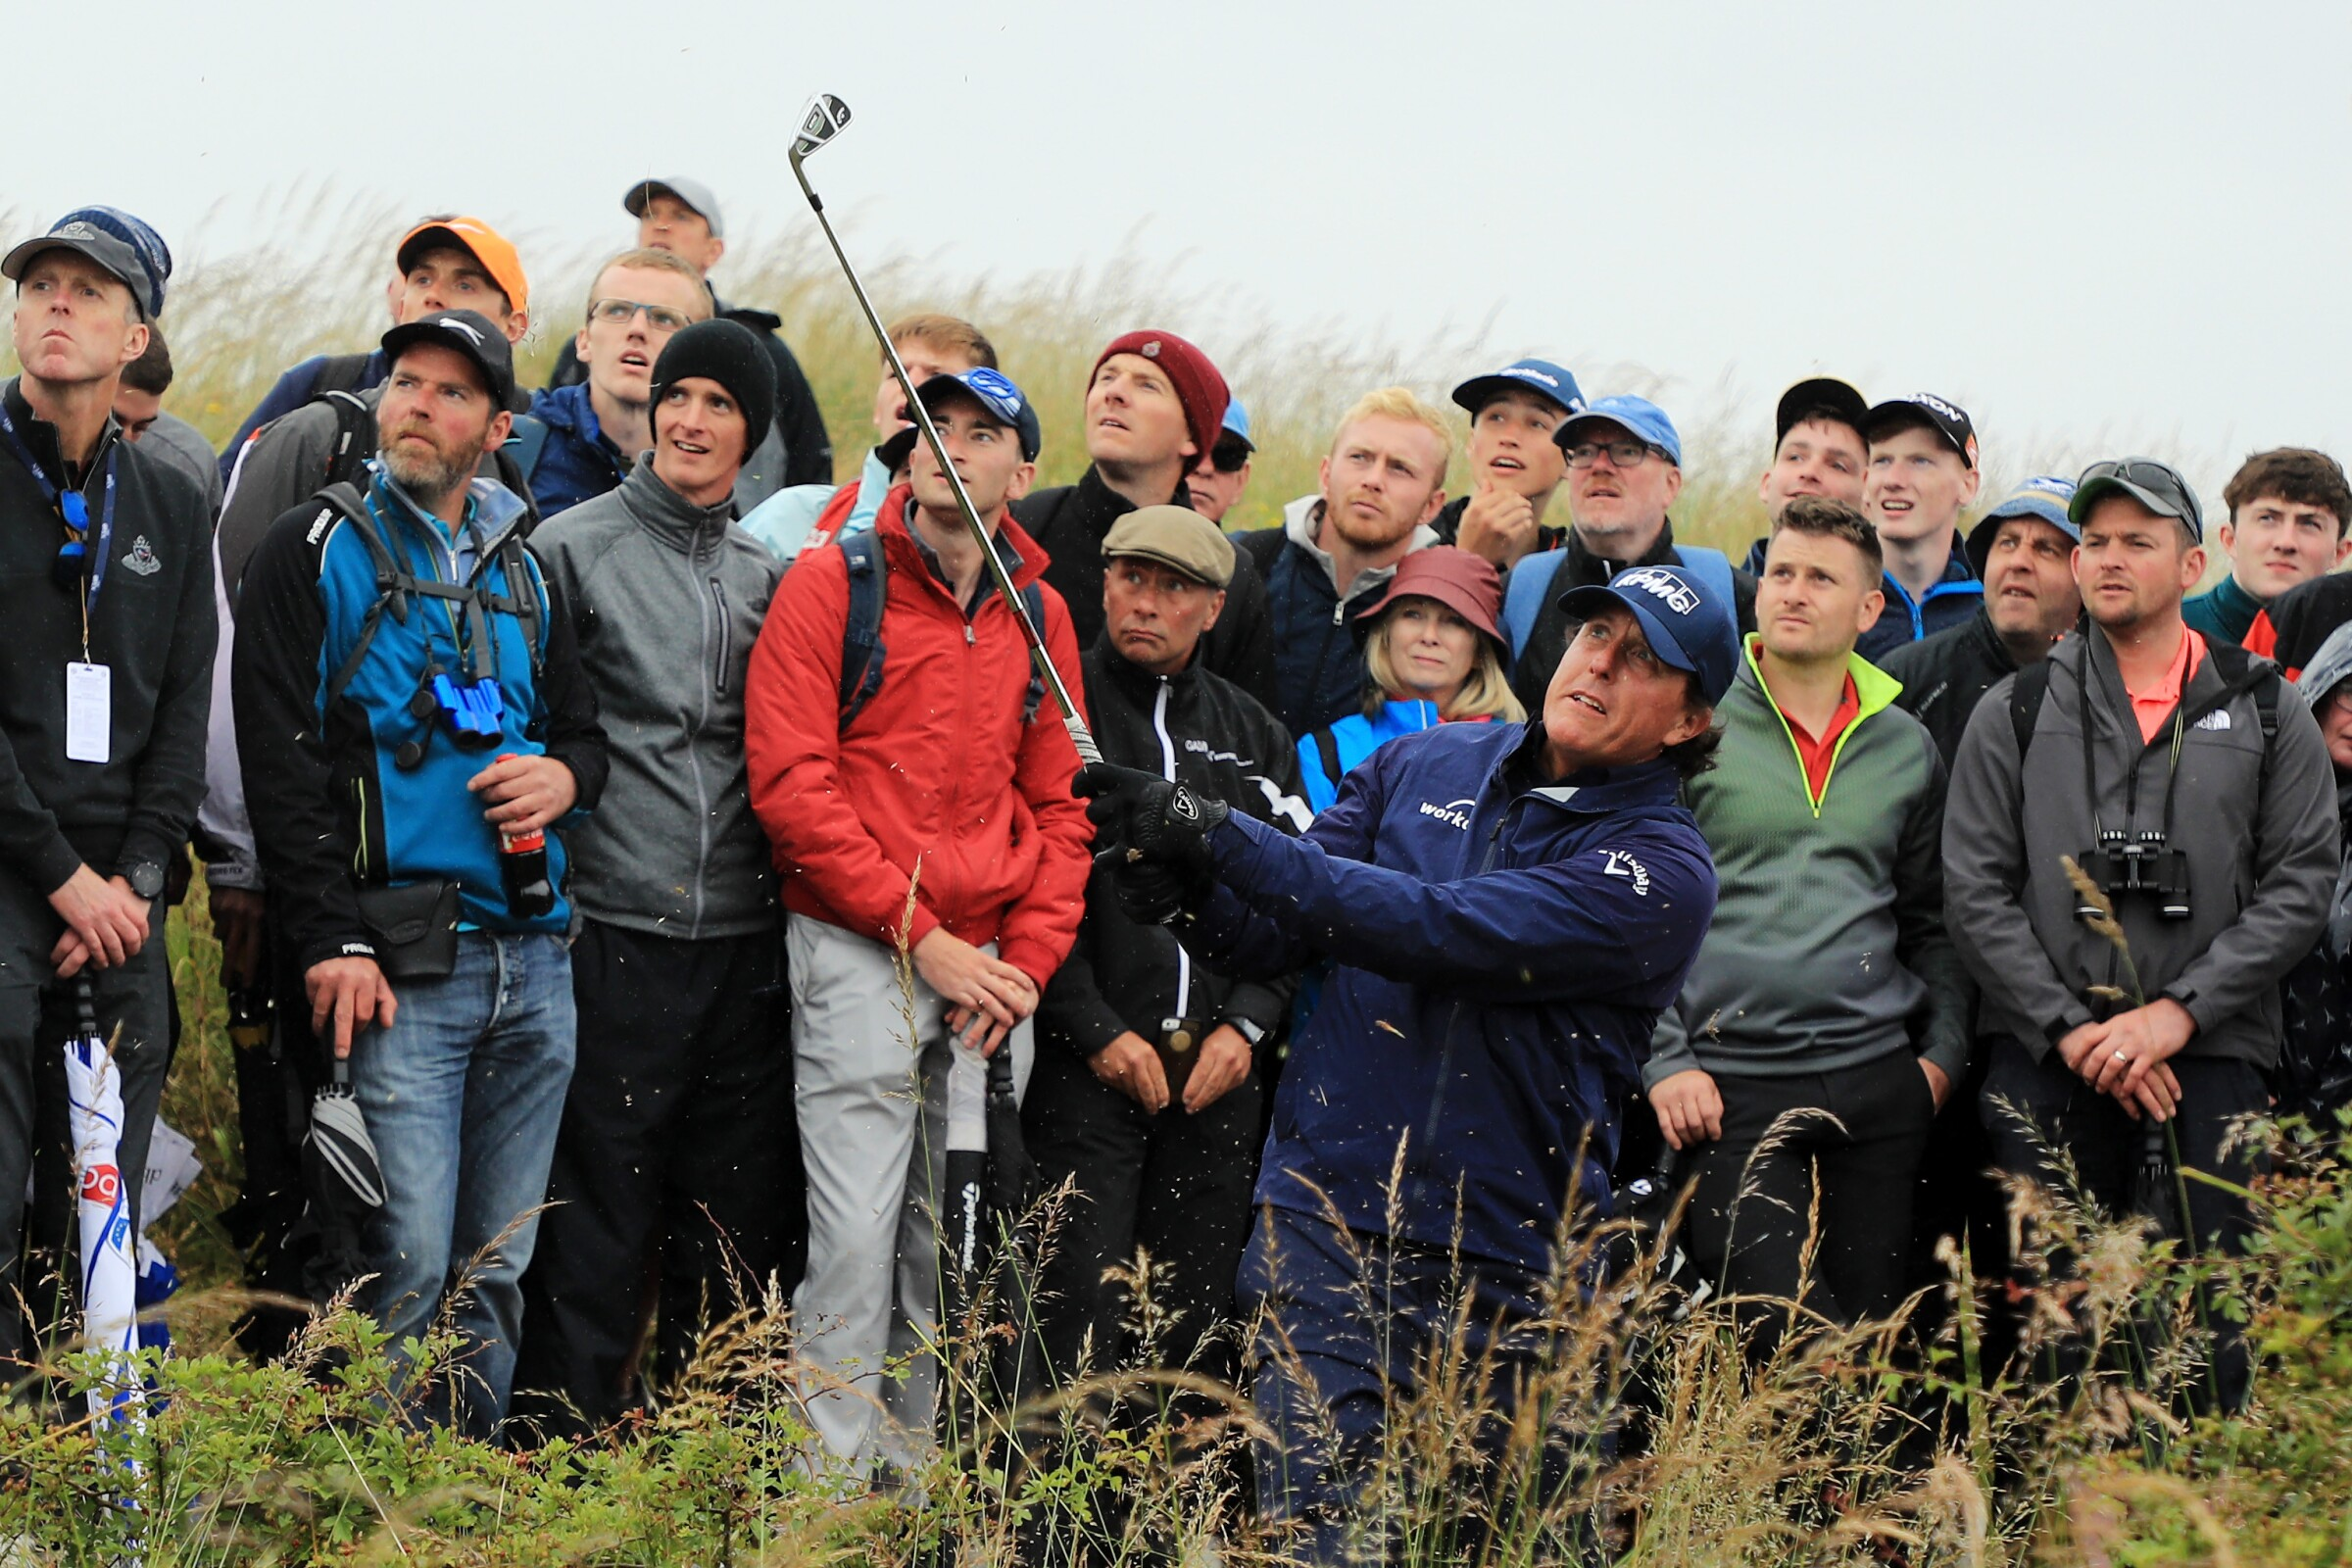 148th British Open Championship - Day 2